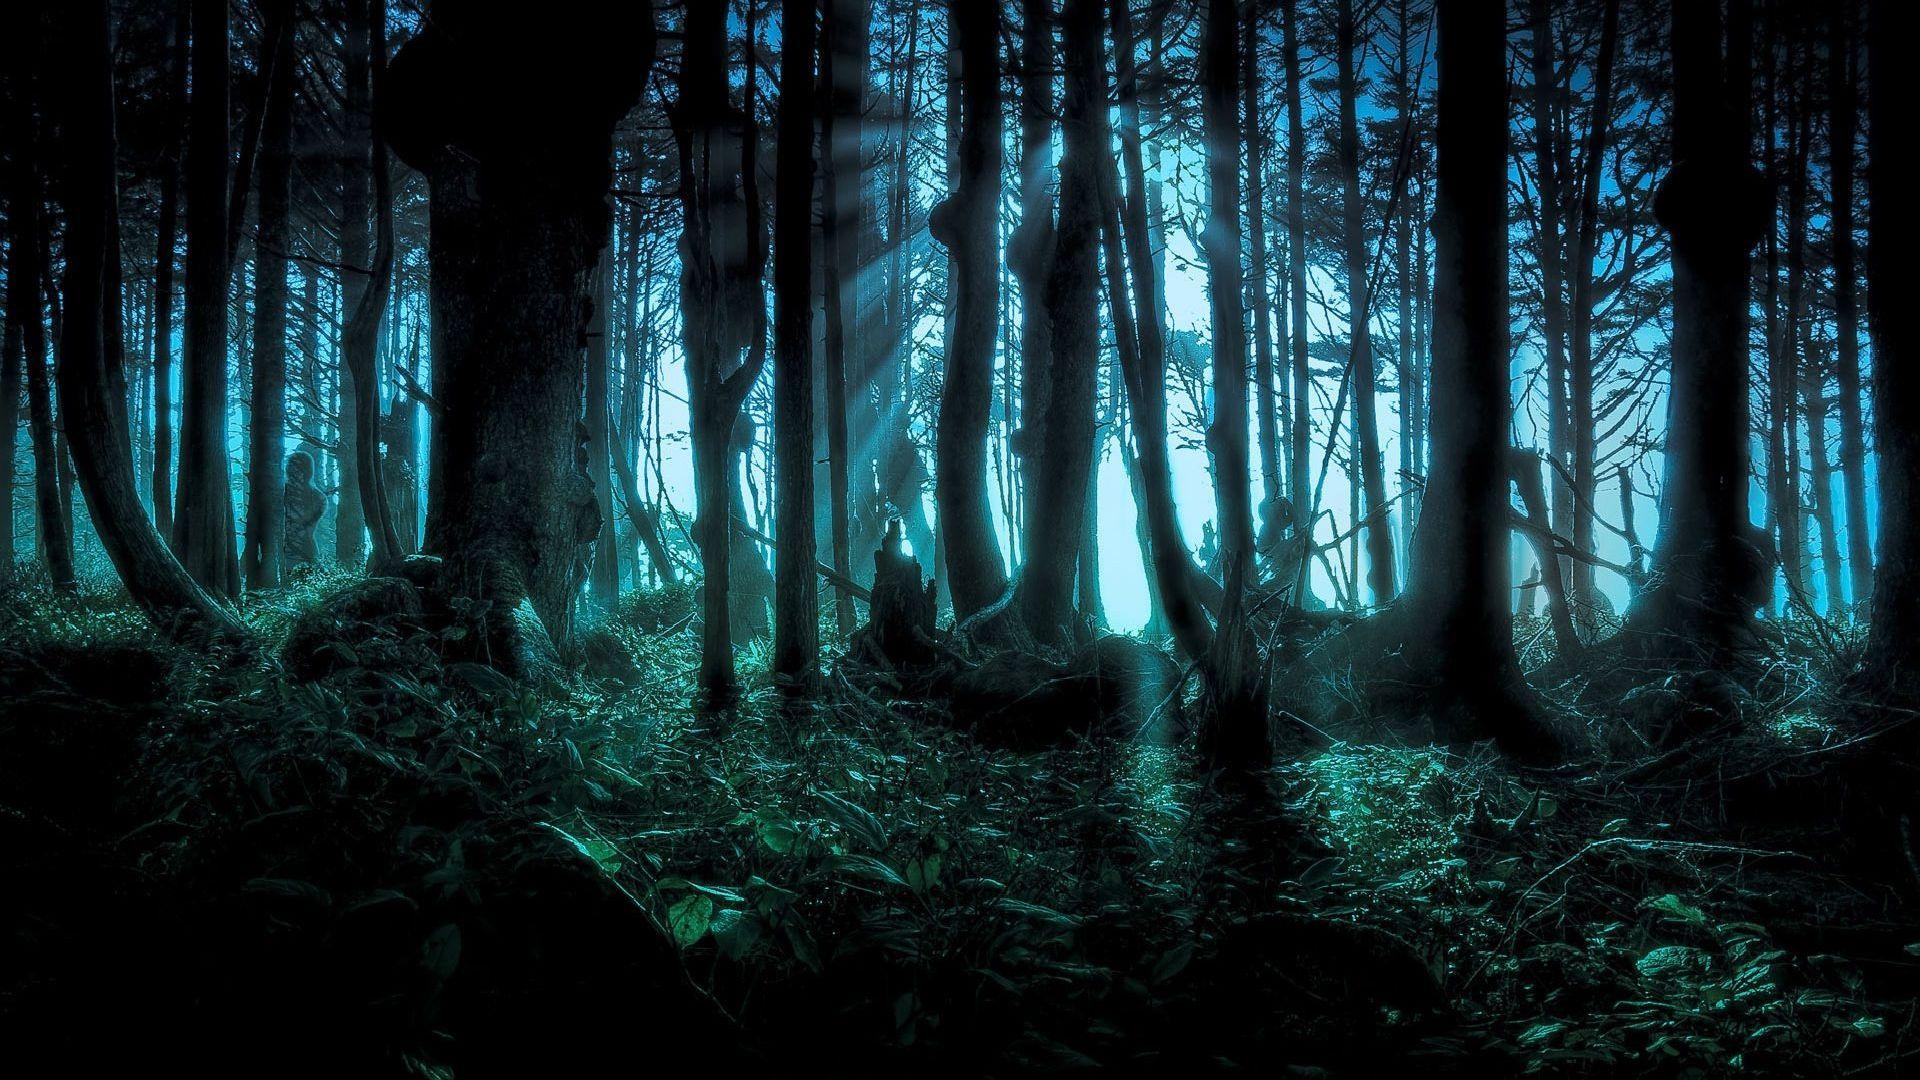 Fantasy Forest Wallpaper 1920x1080 Google Search Fantasy